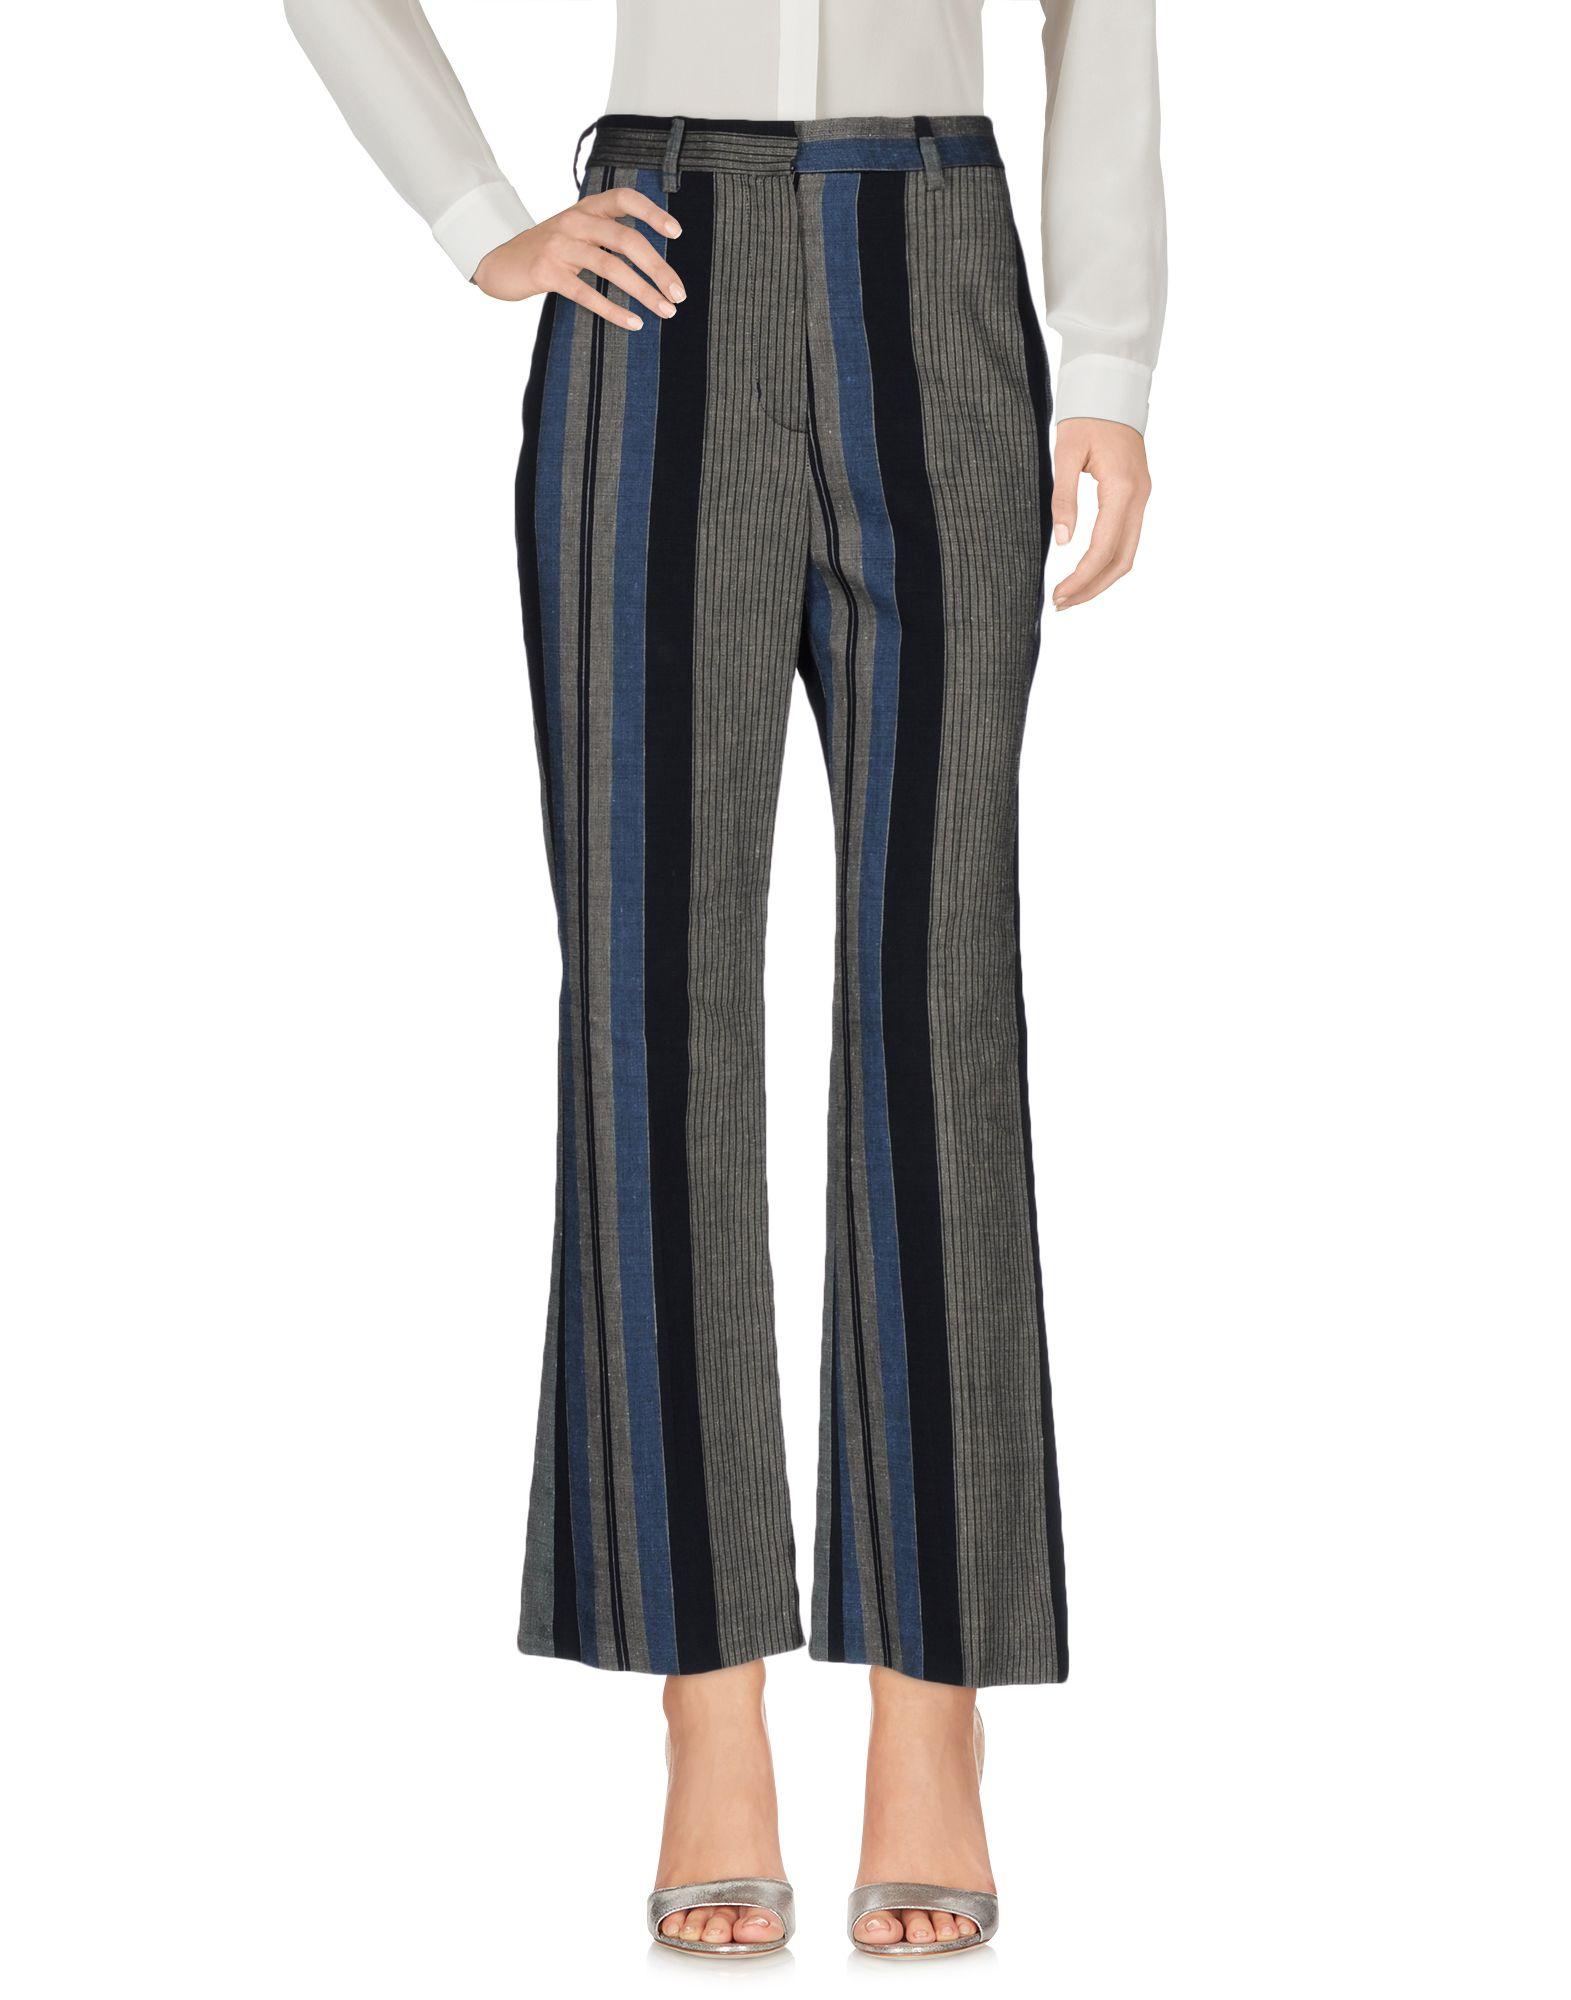 Pantalone Ports 1961 Donna - Acquista online su 5zBSmuskL